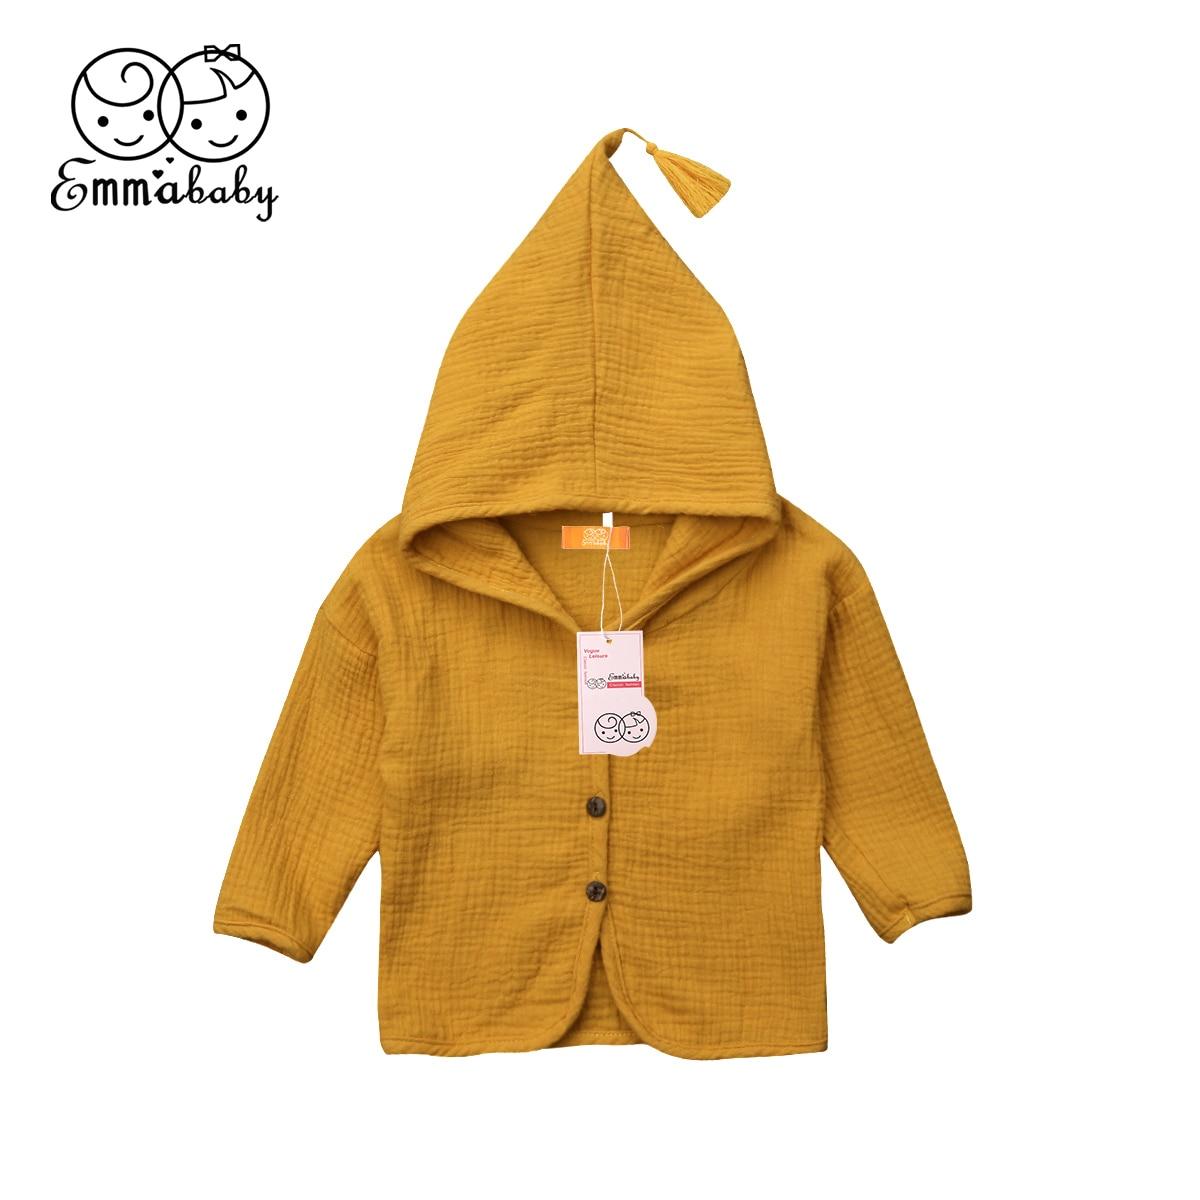 ef9315b7093 2017 Brand New Toddler Infant Kid Baby Boy Girl Jacket Coats Children Warm  Winter Outerwear Kids Best Friend Match Clothes 6M-5T